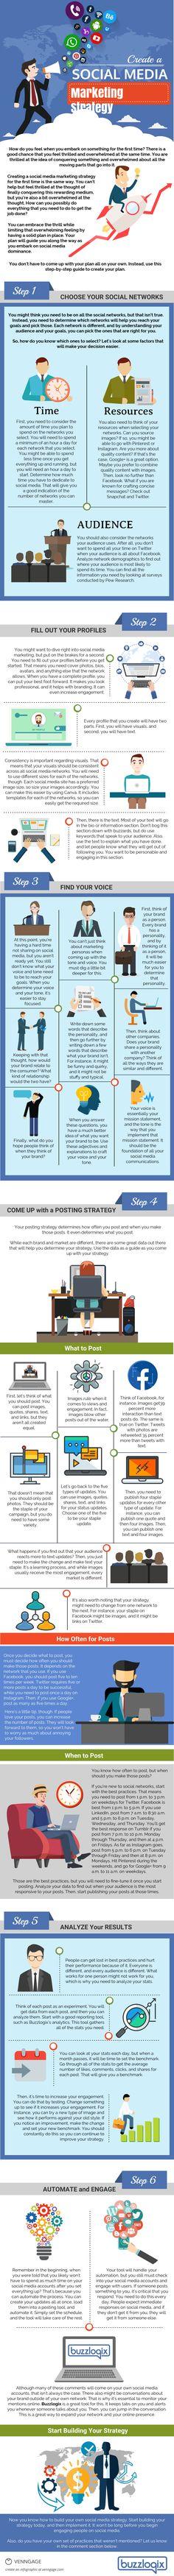 The 688 best Social Media & Social Good images on Pinterest | Snood ...